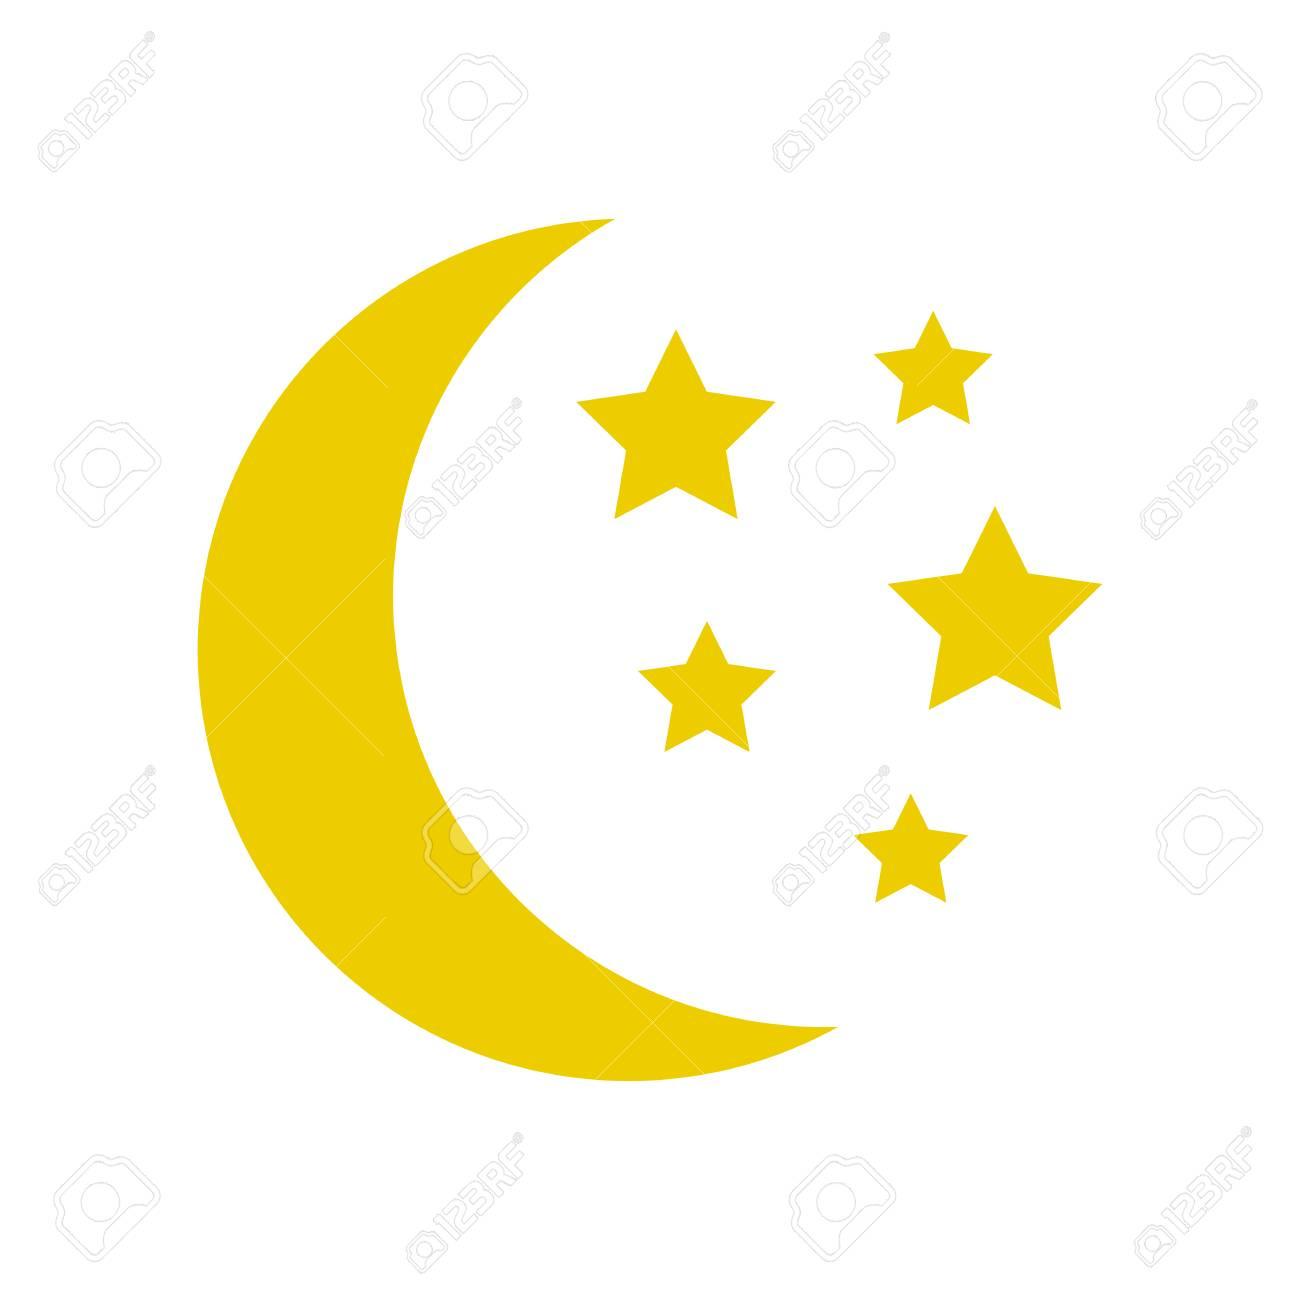 Moon and stars, yellow sleep icon. Vector illustration - 93051294